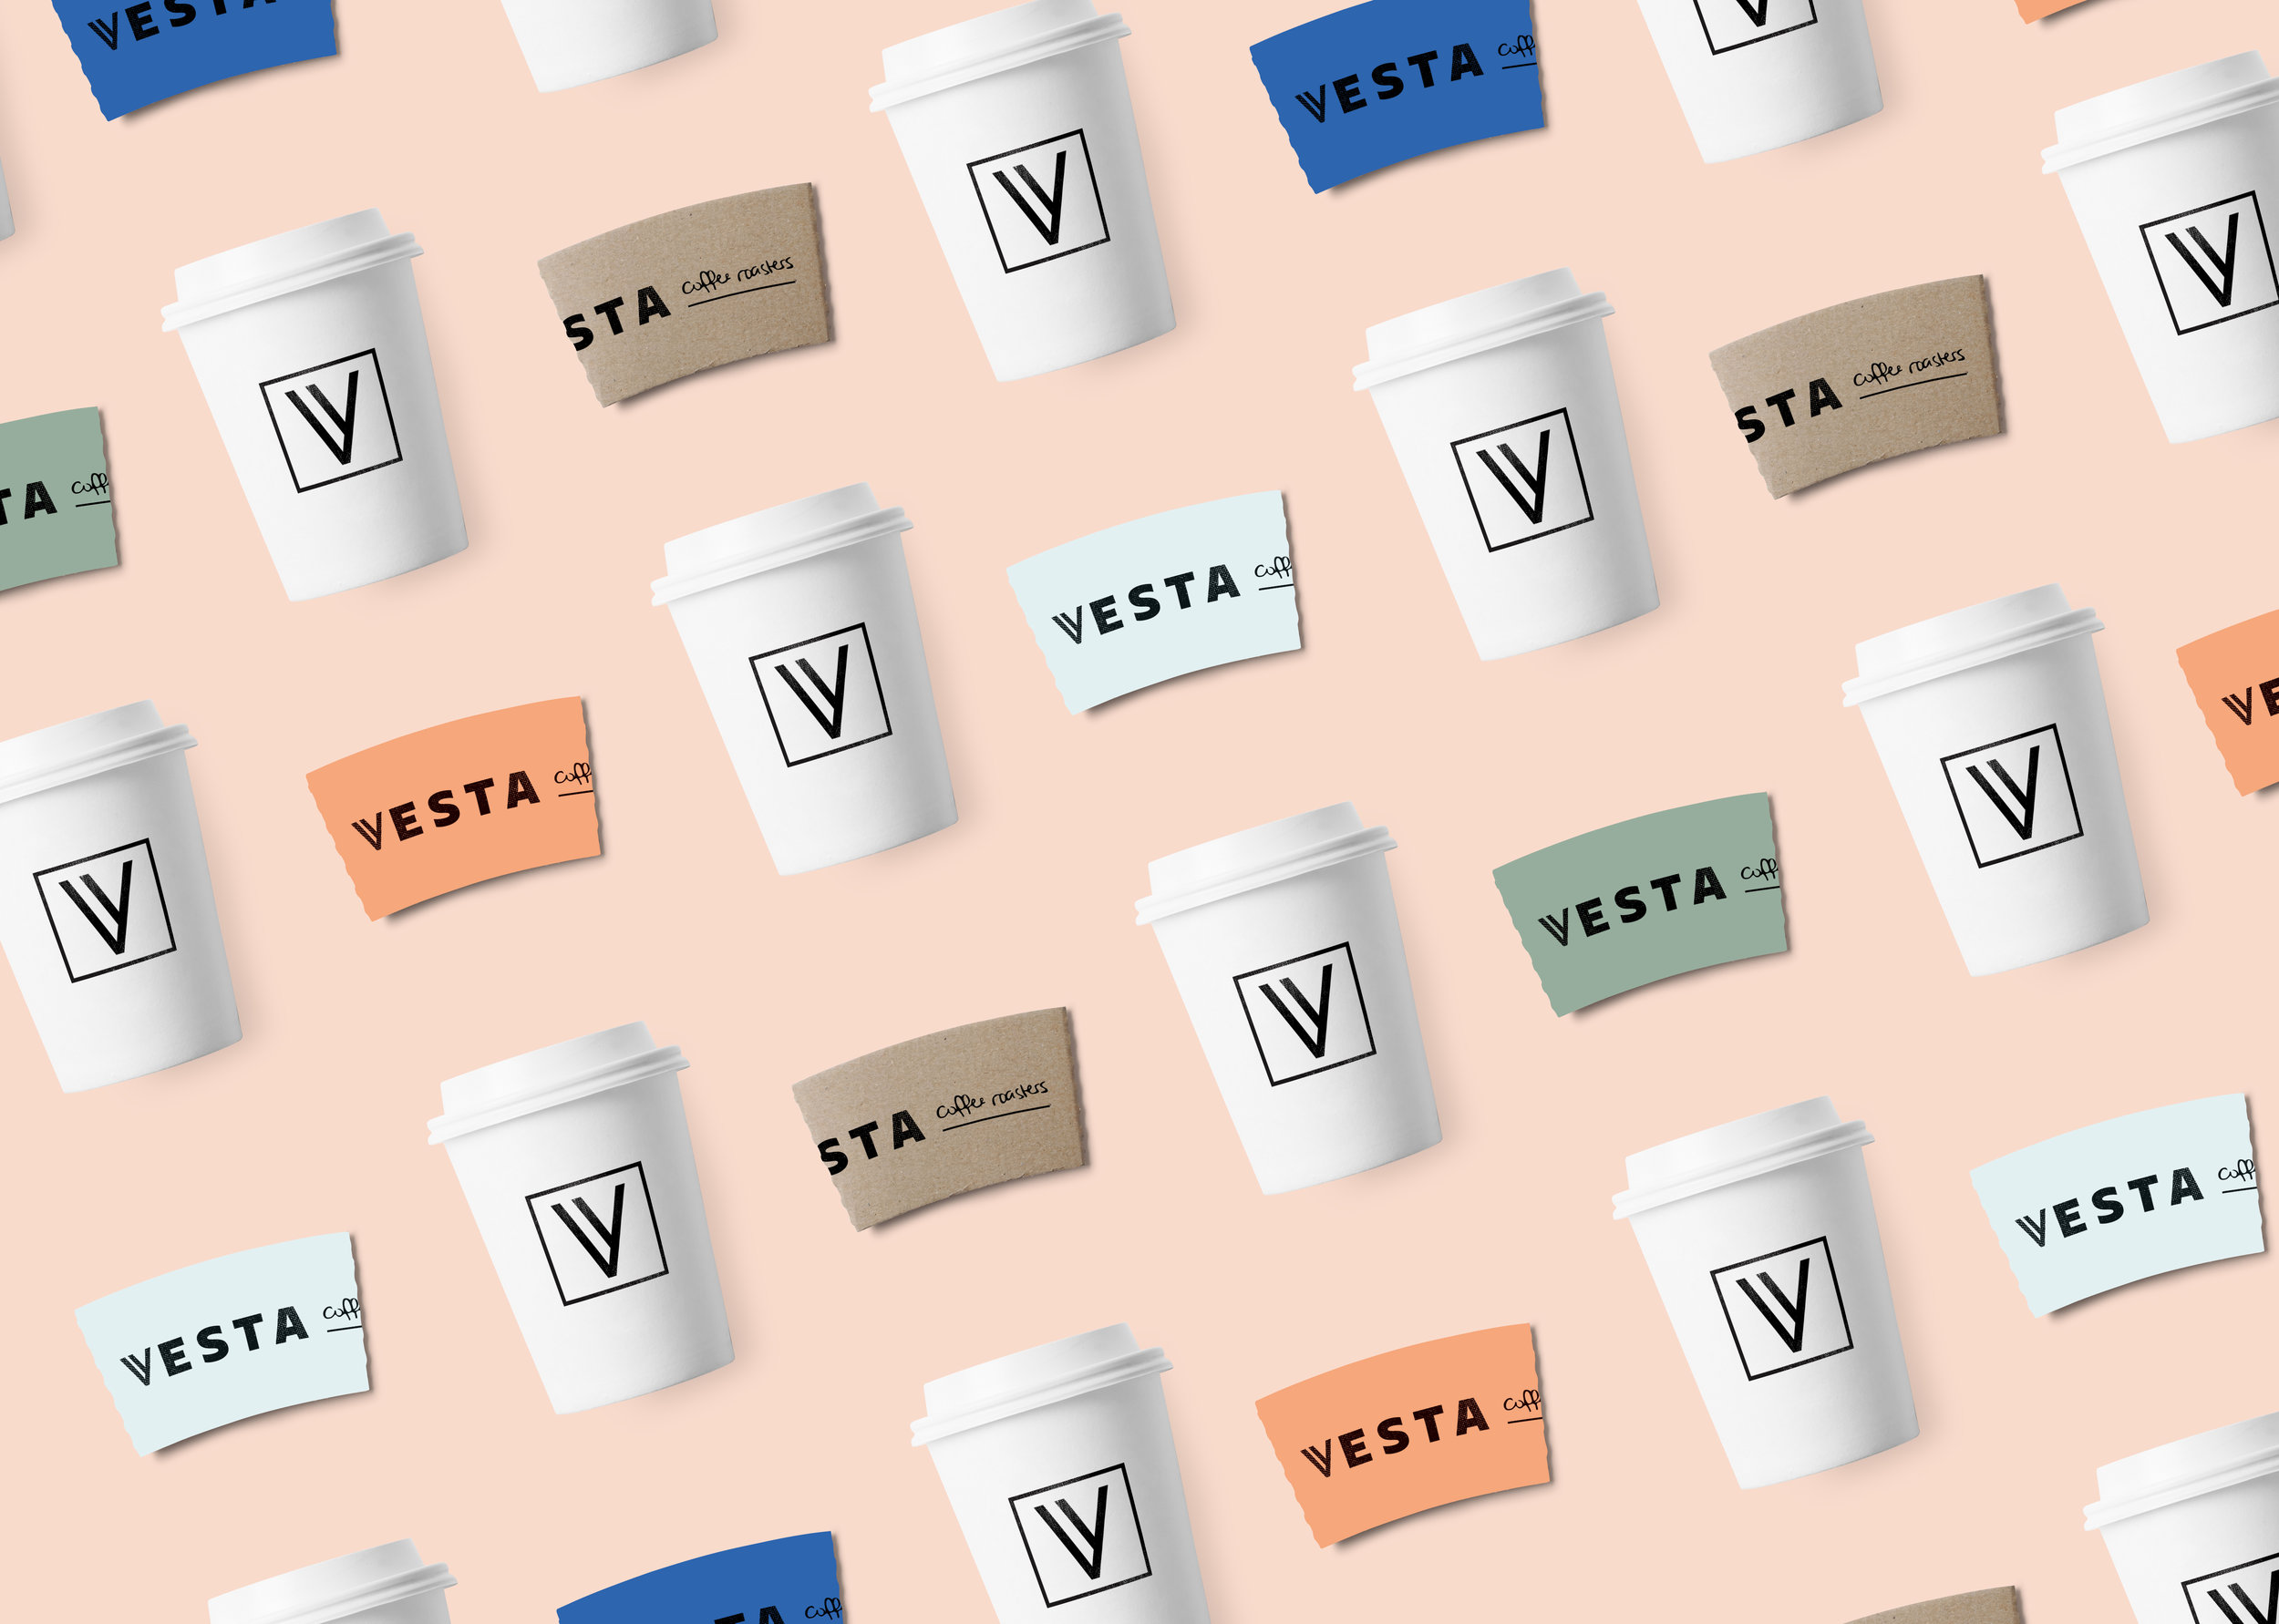 03_Coffee_Stationery_Mockup_VESTA_CUPS.jpg